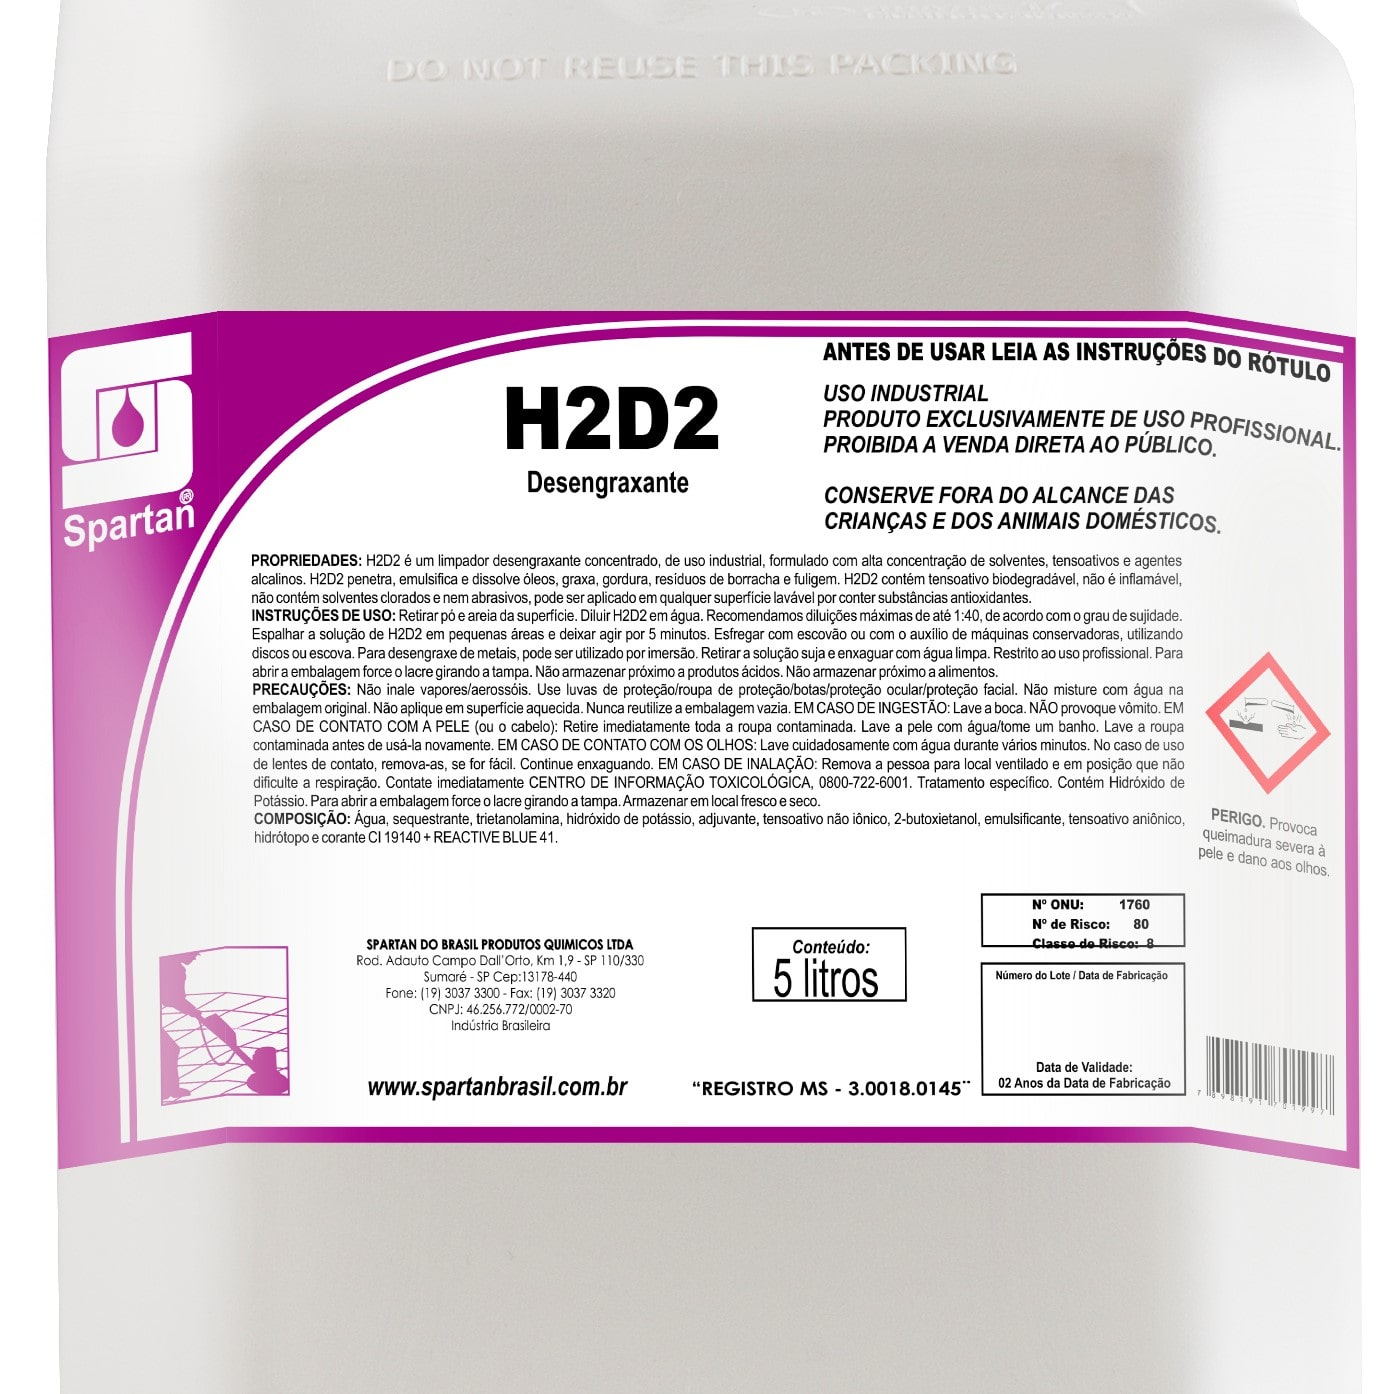 H2D2 Desengraxante 5 Litros Spartan  - Higinet